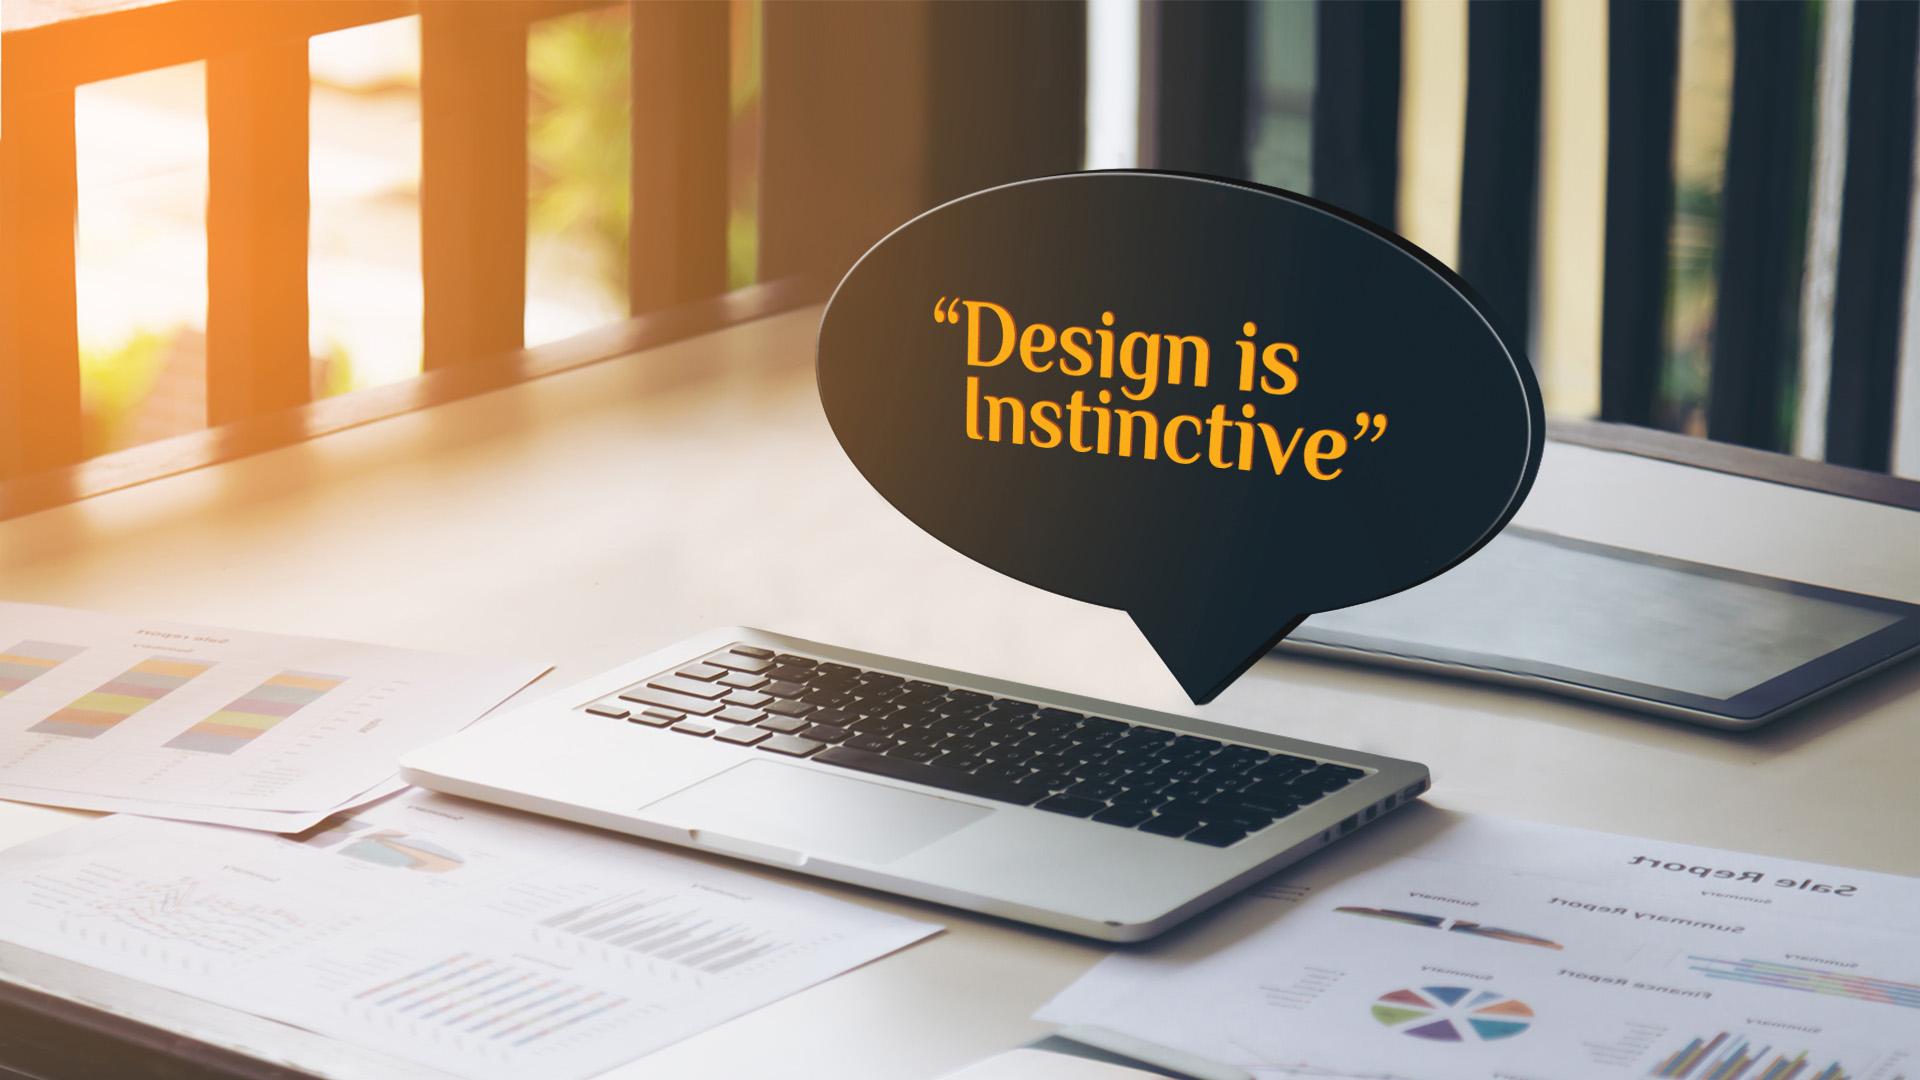 Design is instinctive